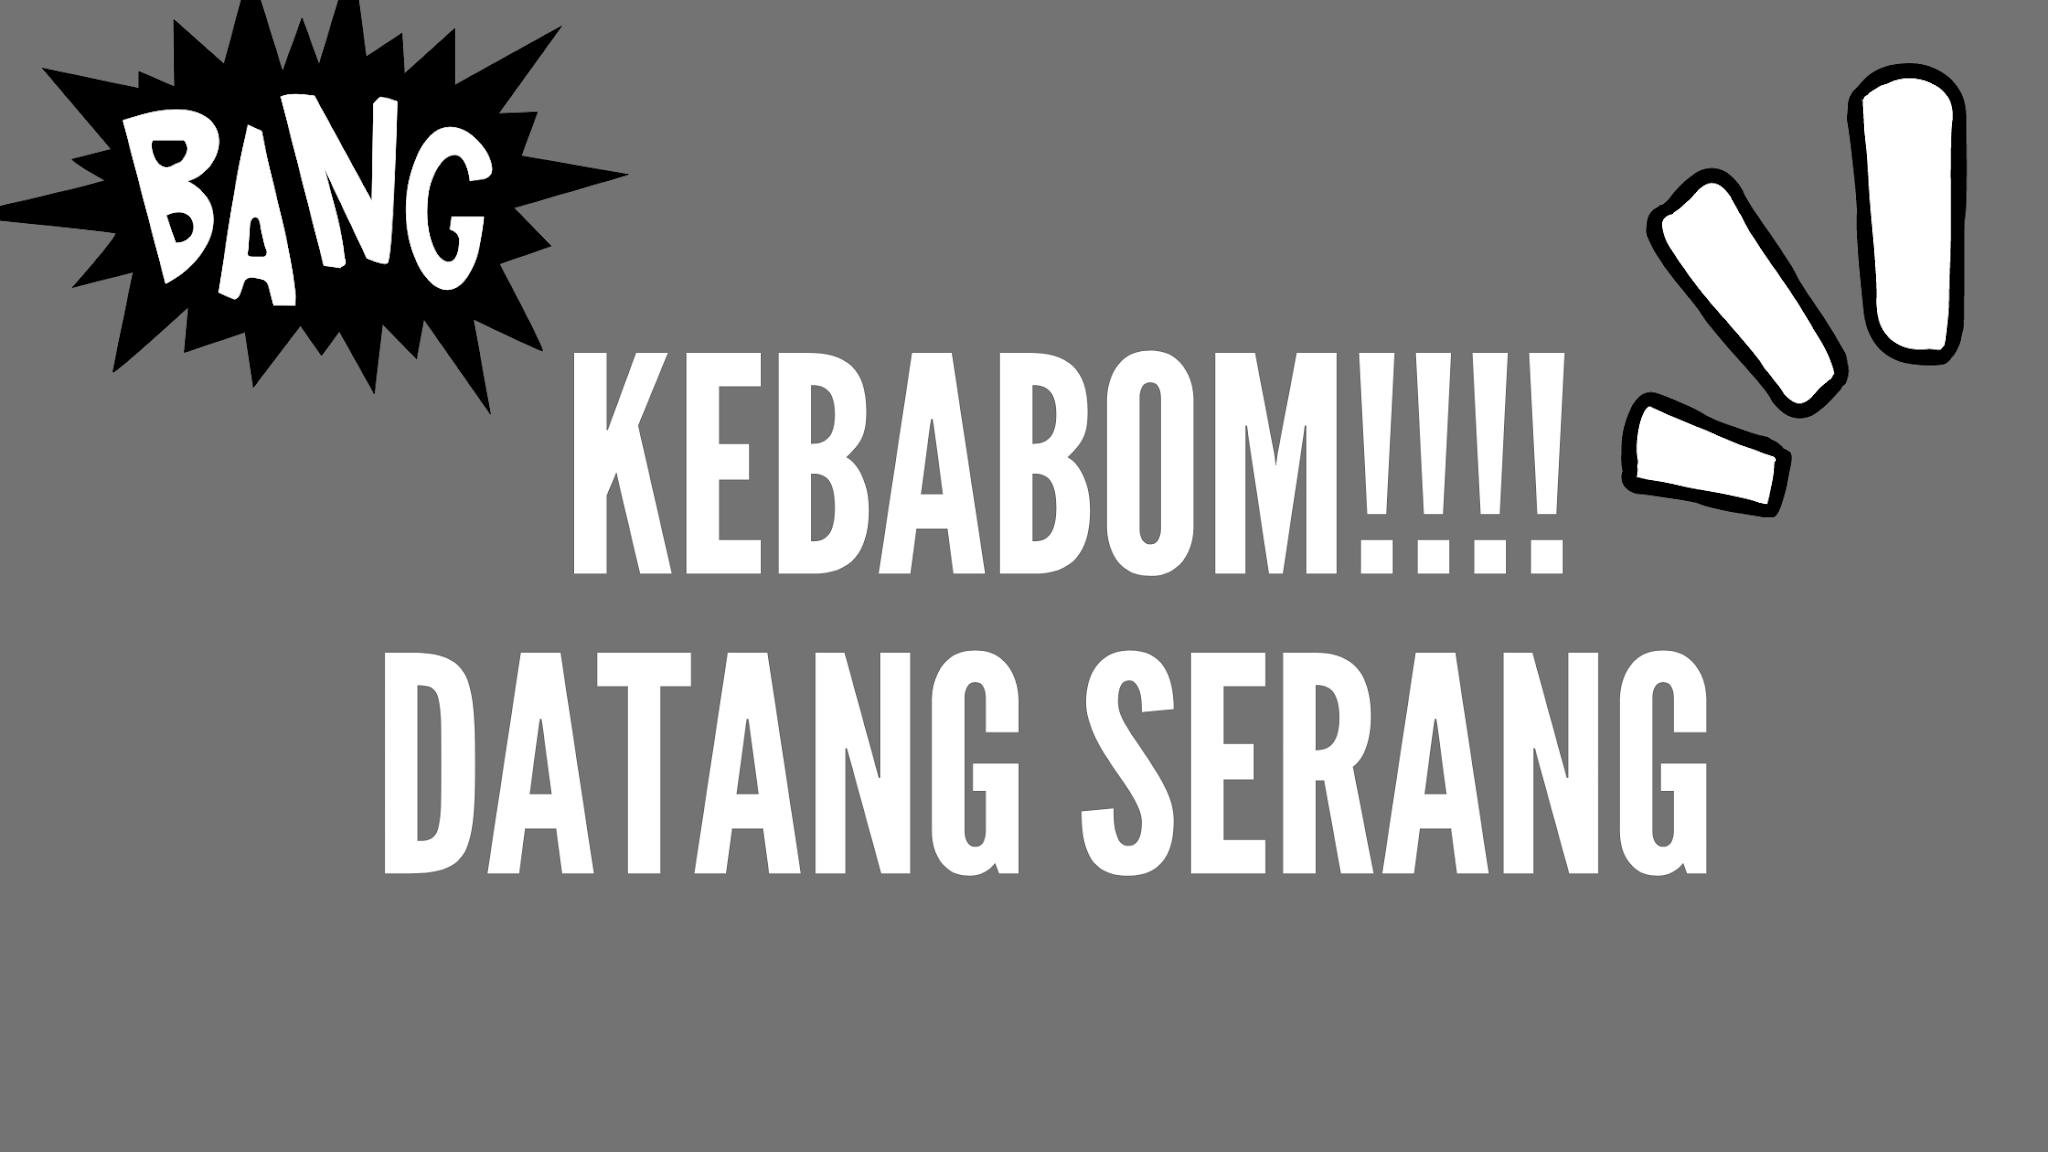 Kebabom!!!! Datang Serang